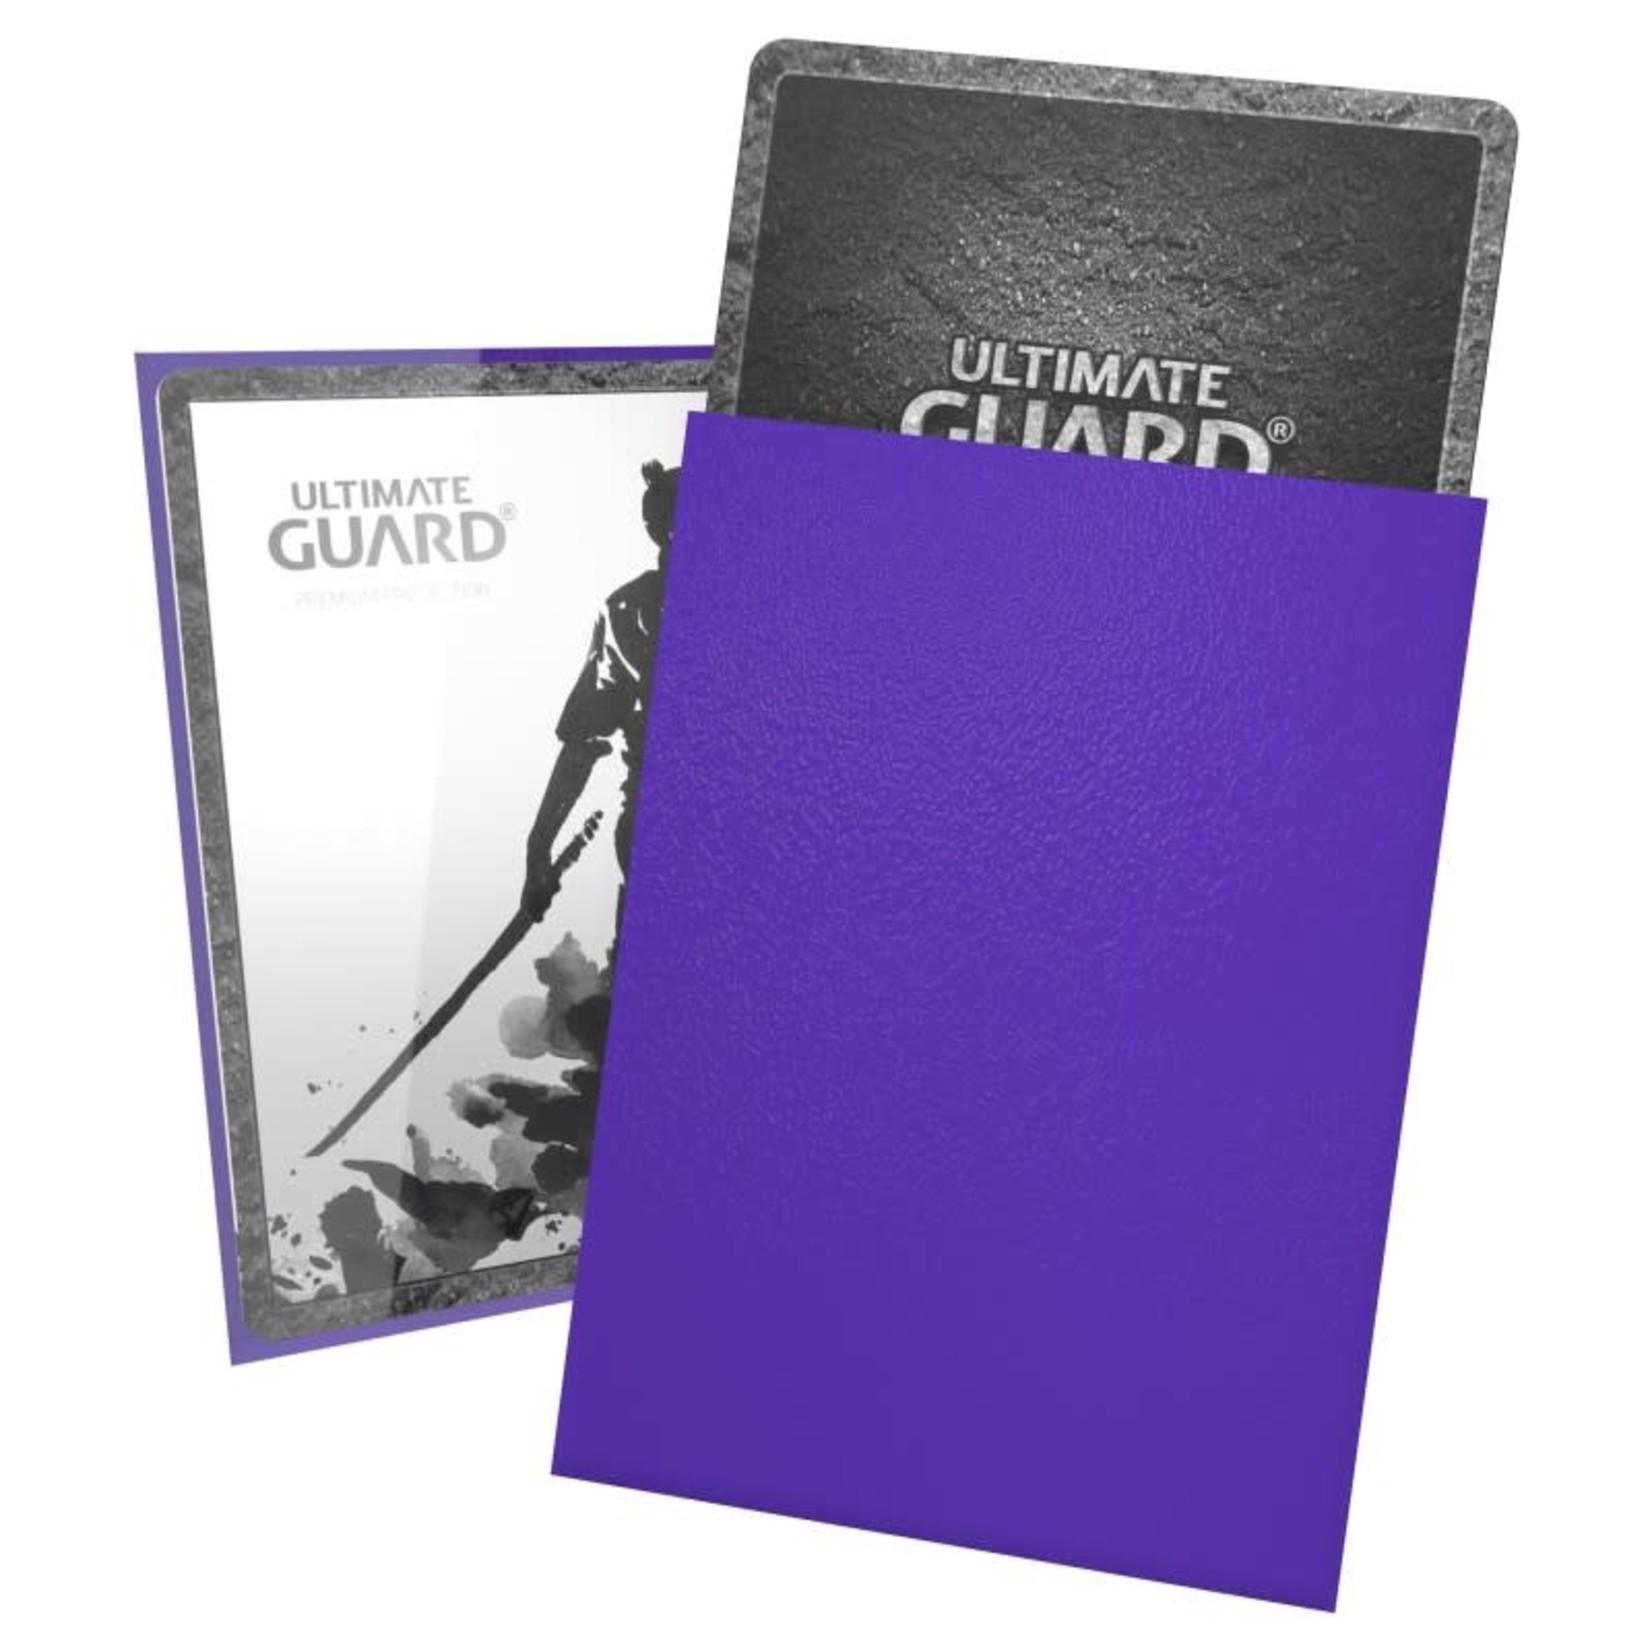 Ultimate Guard Katana Sleeves Blue - Ultimate Guard